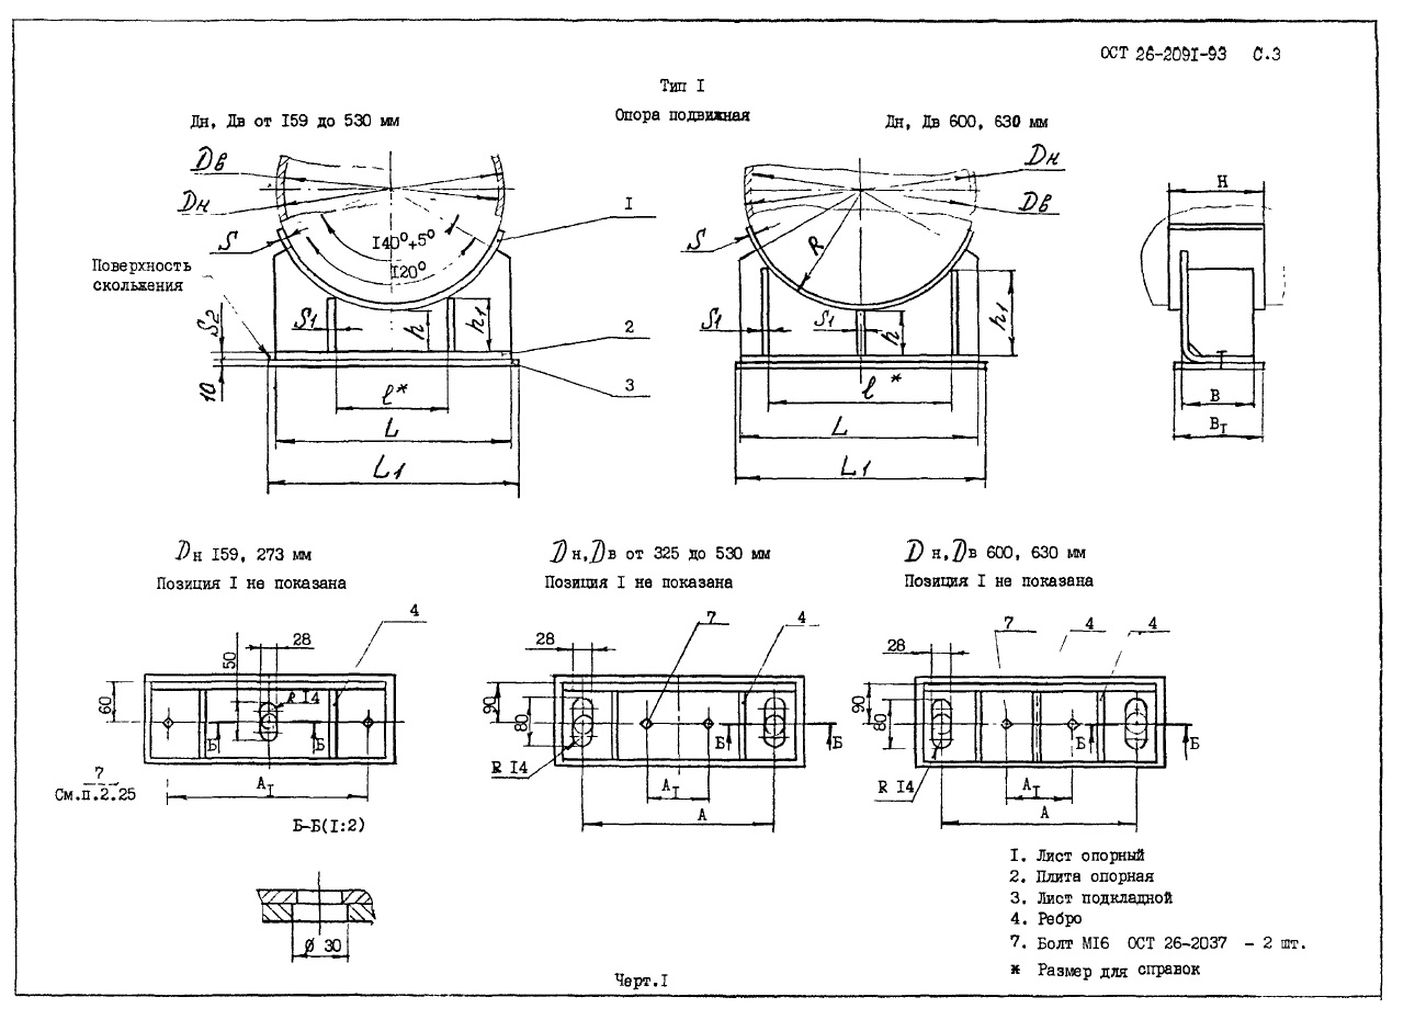 Опоры тип 1 ОСТ 26-2091-93 стр.1